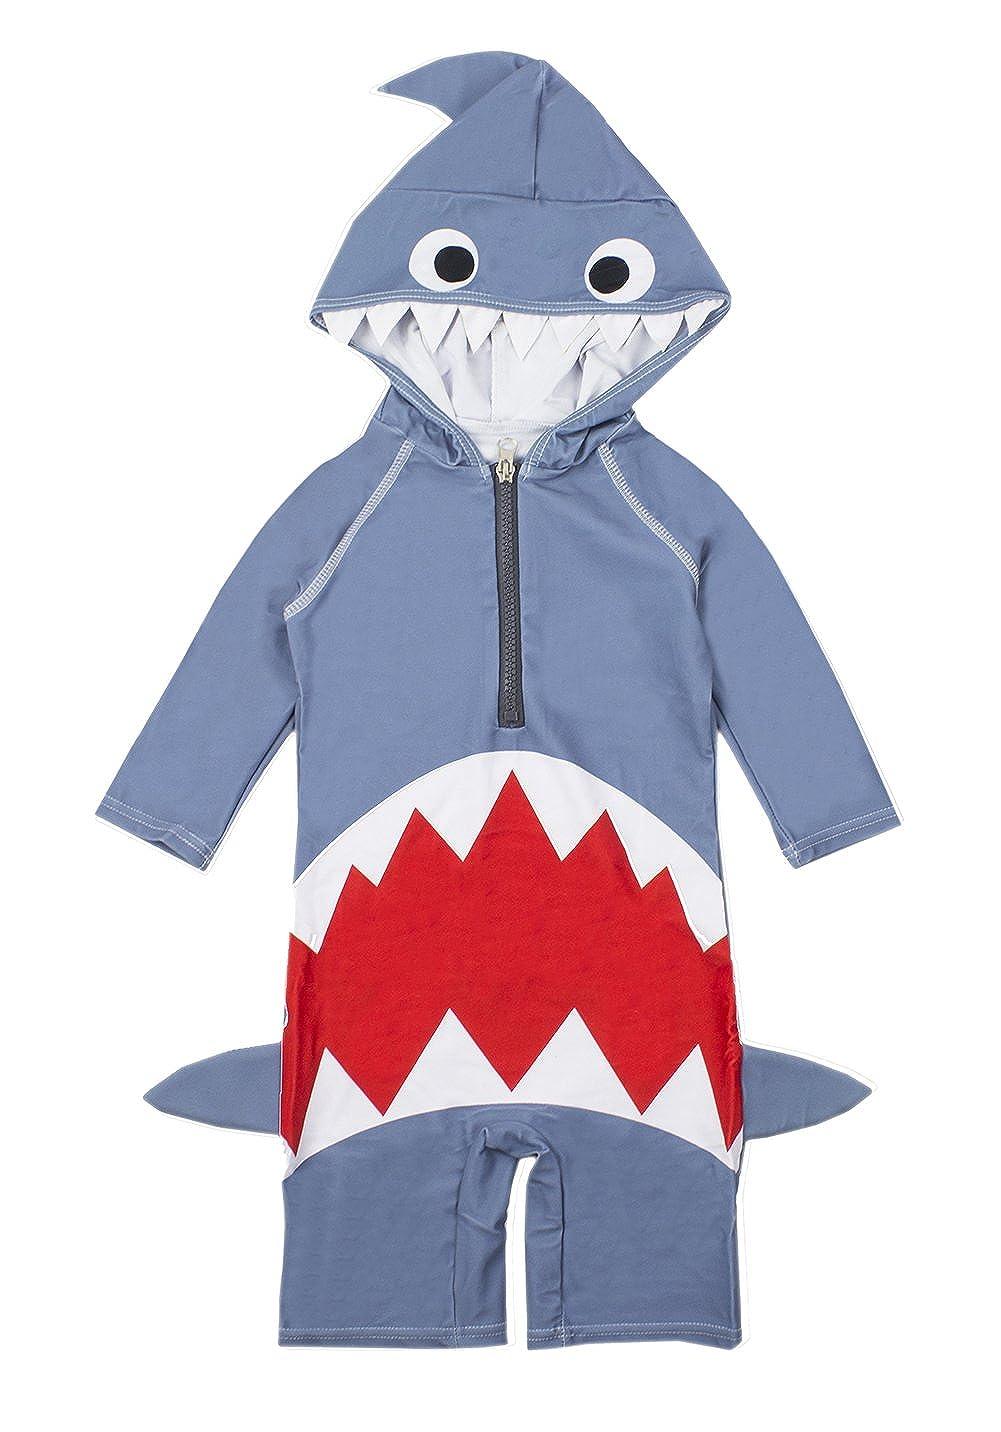 TiaoBug Kids Boys Girls Rash Guard Shark Swimsuit Swimwear One-Piece Swim Jumpsuit 3//4 Sleeves UPF 50 Diving Suits